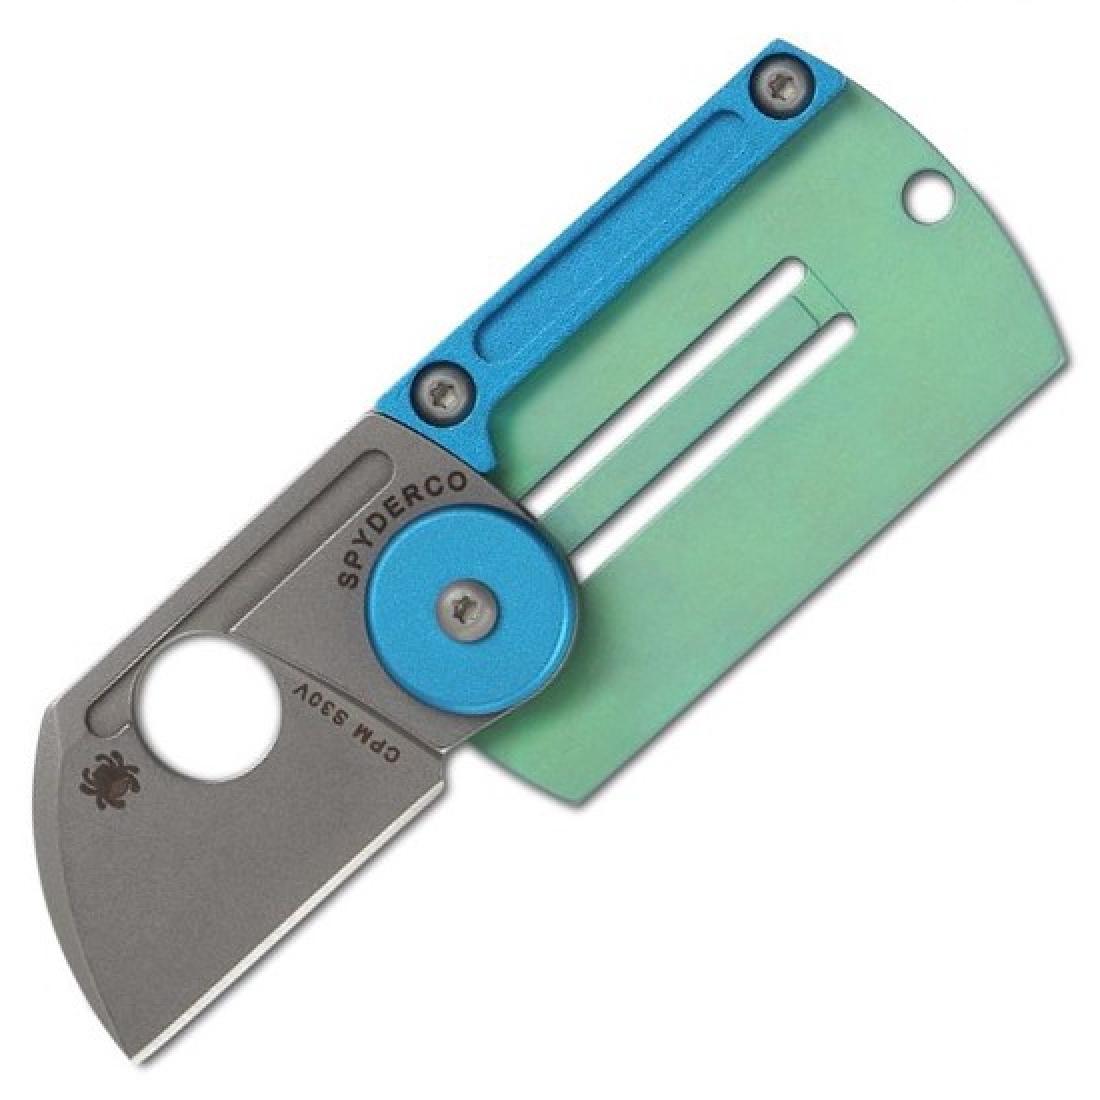 Складной нож-брелок Dog Tag Folder - Spyderco С188ALTIP, сталь CPM S30V, рукоять титан/алюминий